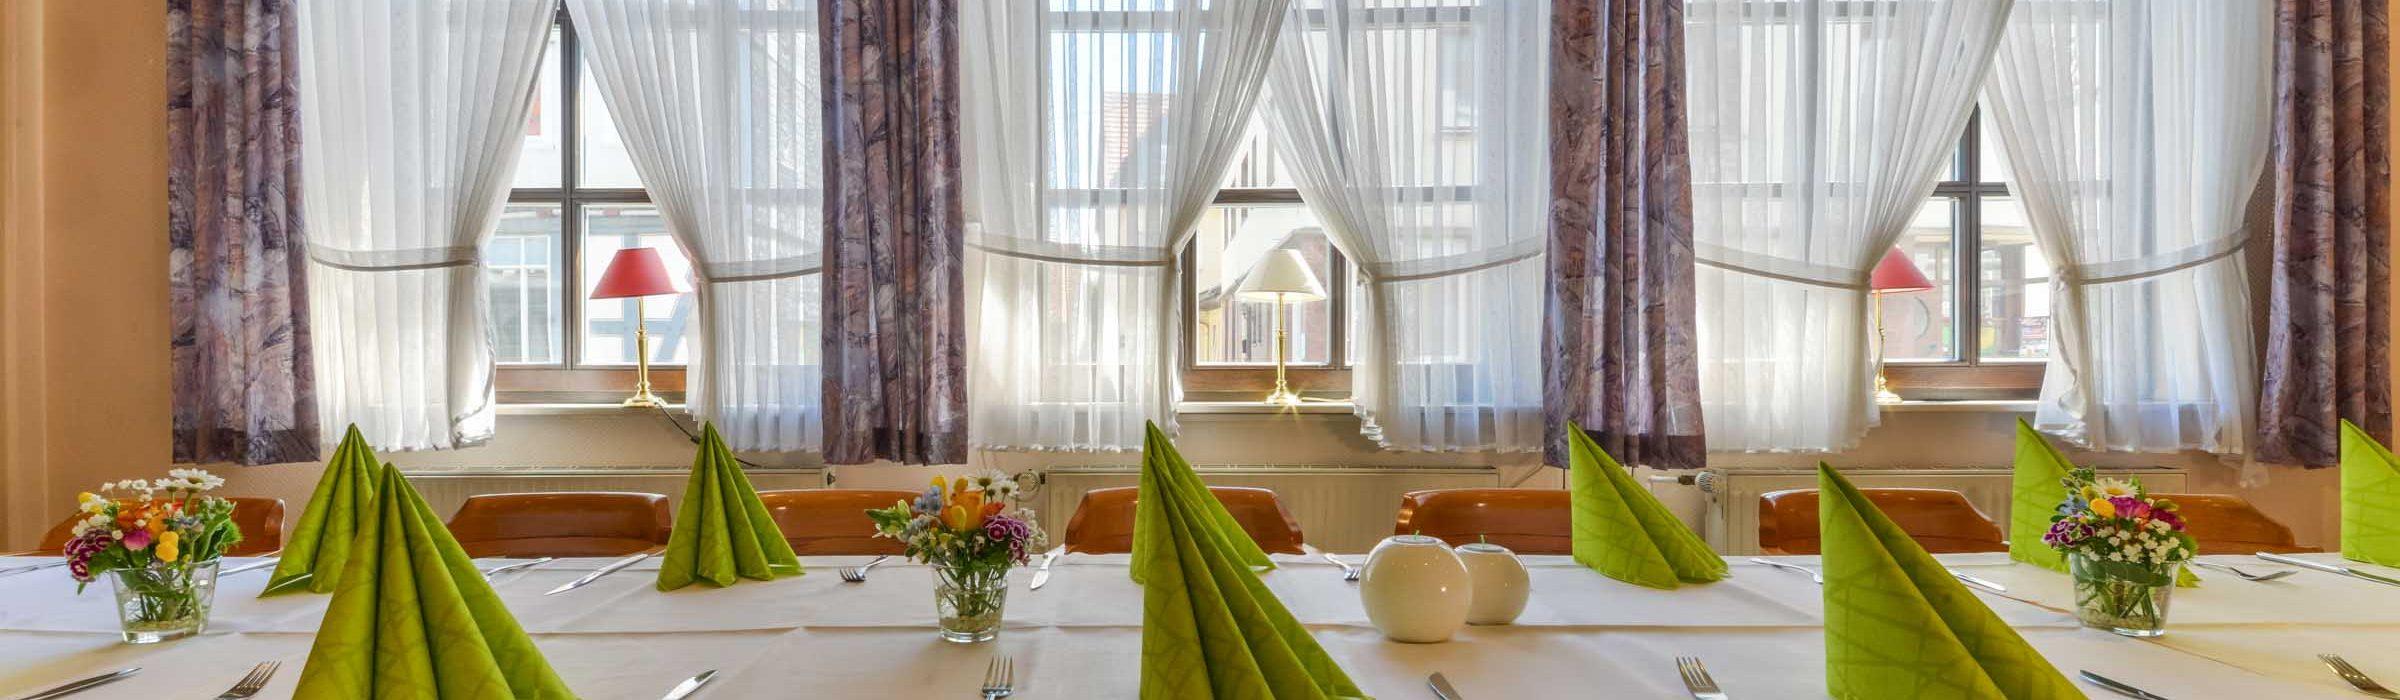 Hotel Restaurant Hessischer Hof Kirchhain - Feier Veranstaltung Feiern & Tagen